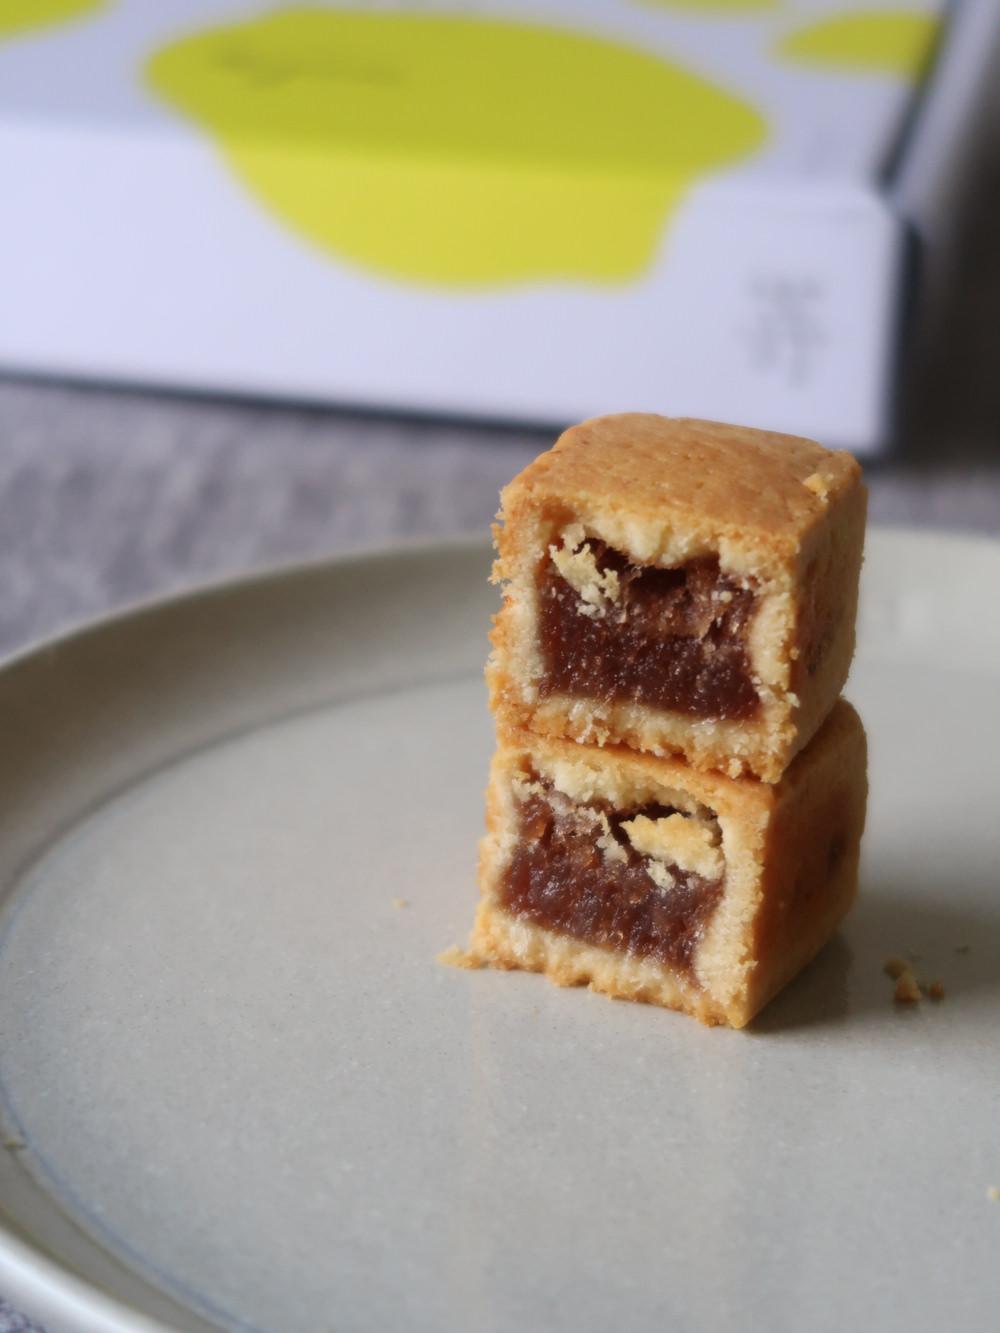 SAKImoto bakery 高級果物盒,精緻果醬酥搶攻中秋禮盒市場!